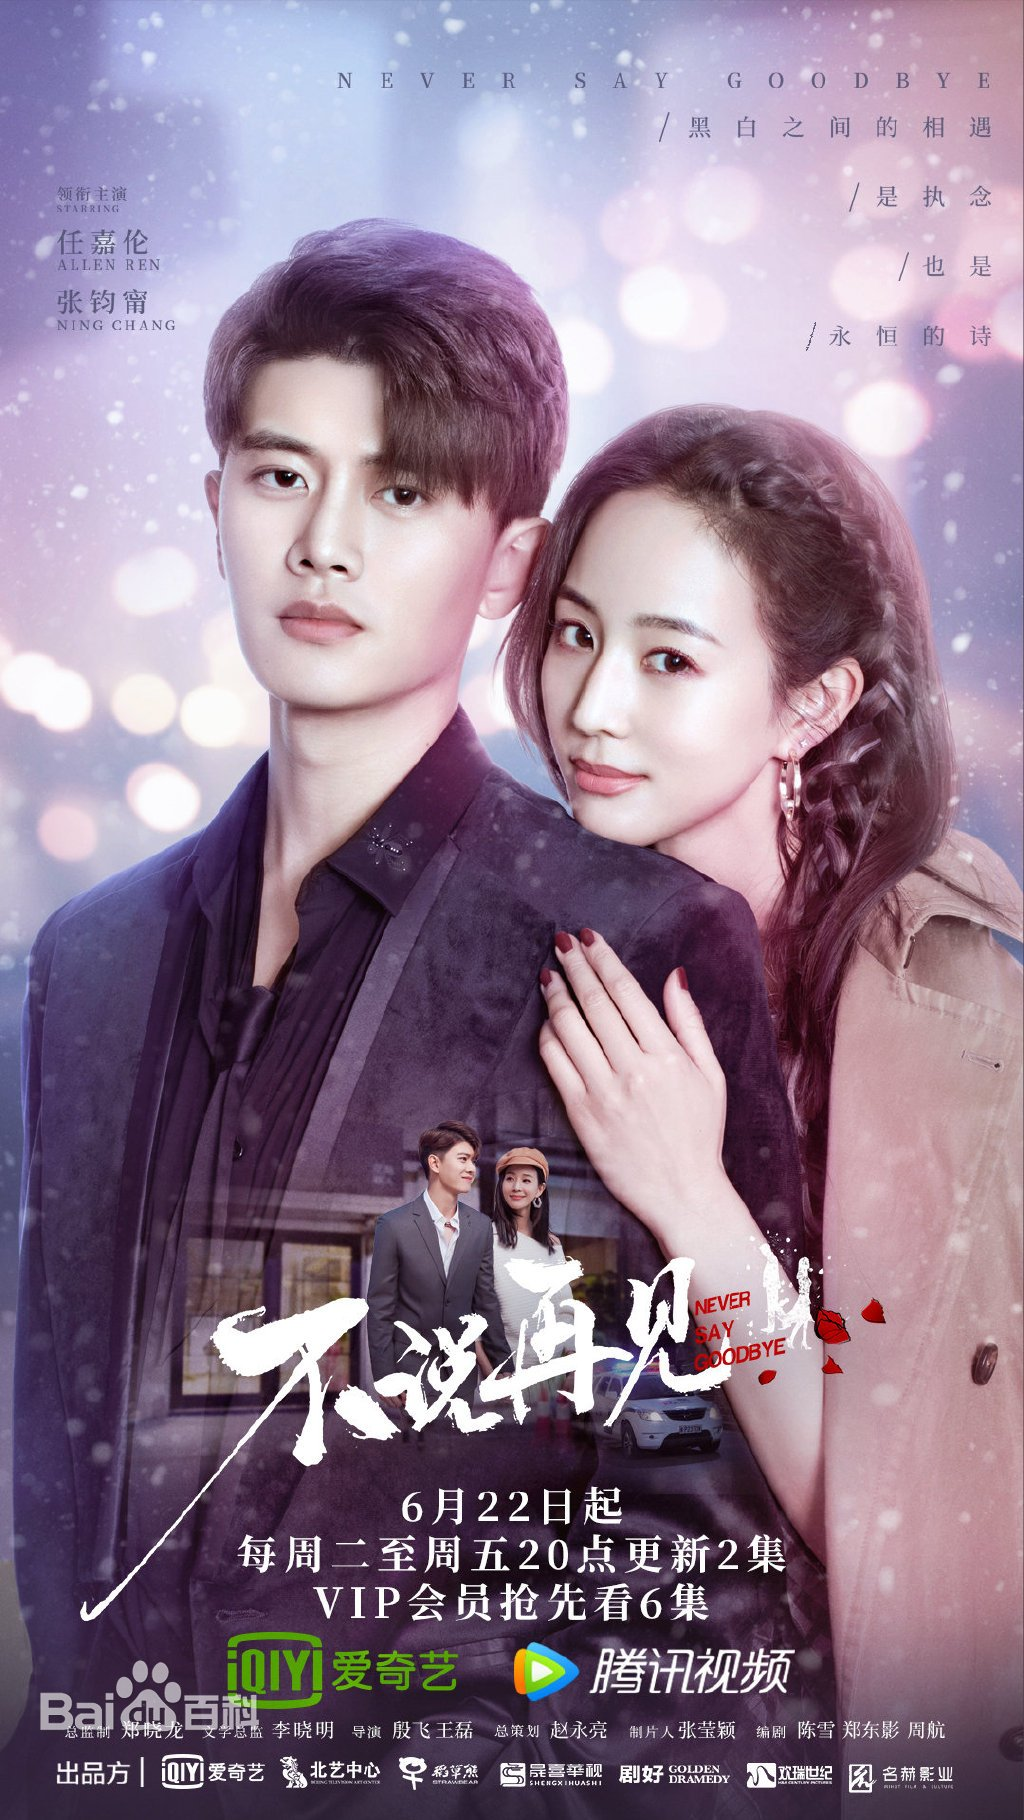 Never Say Goodbye Chinese Drama Poster